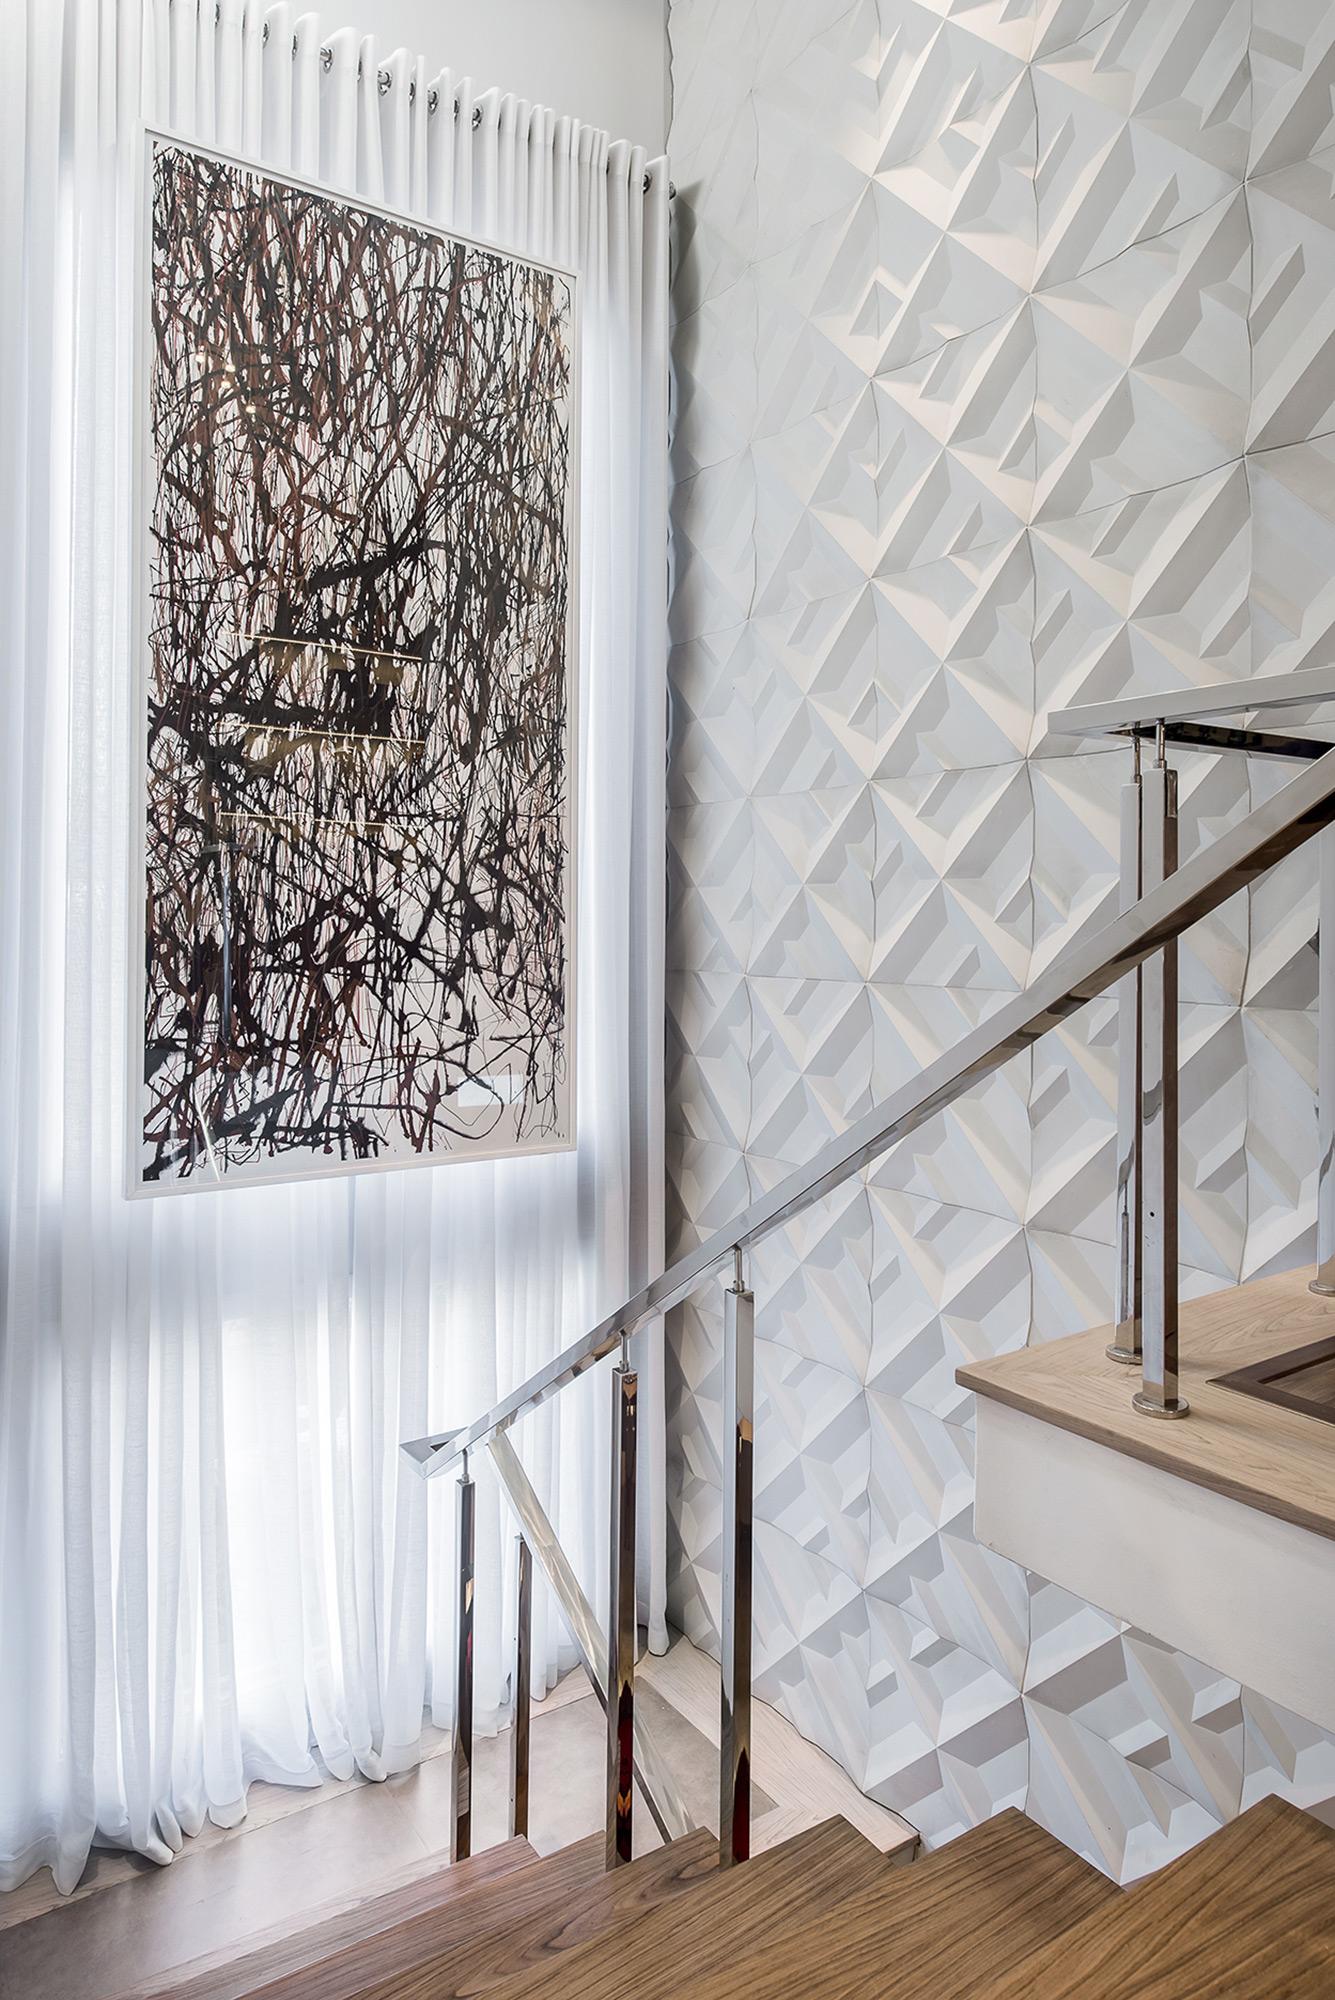 Matrice Paris Branco - Arquiteta Maira Ritter - Foto Claudio Fonseca